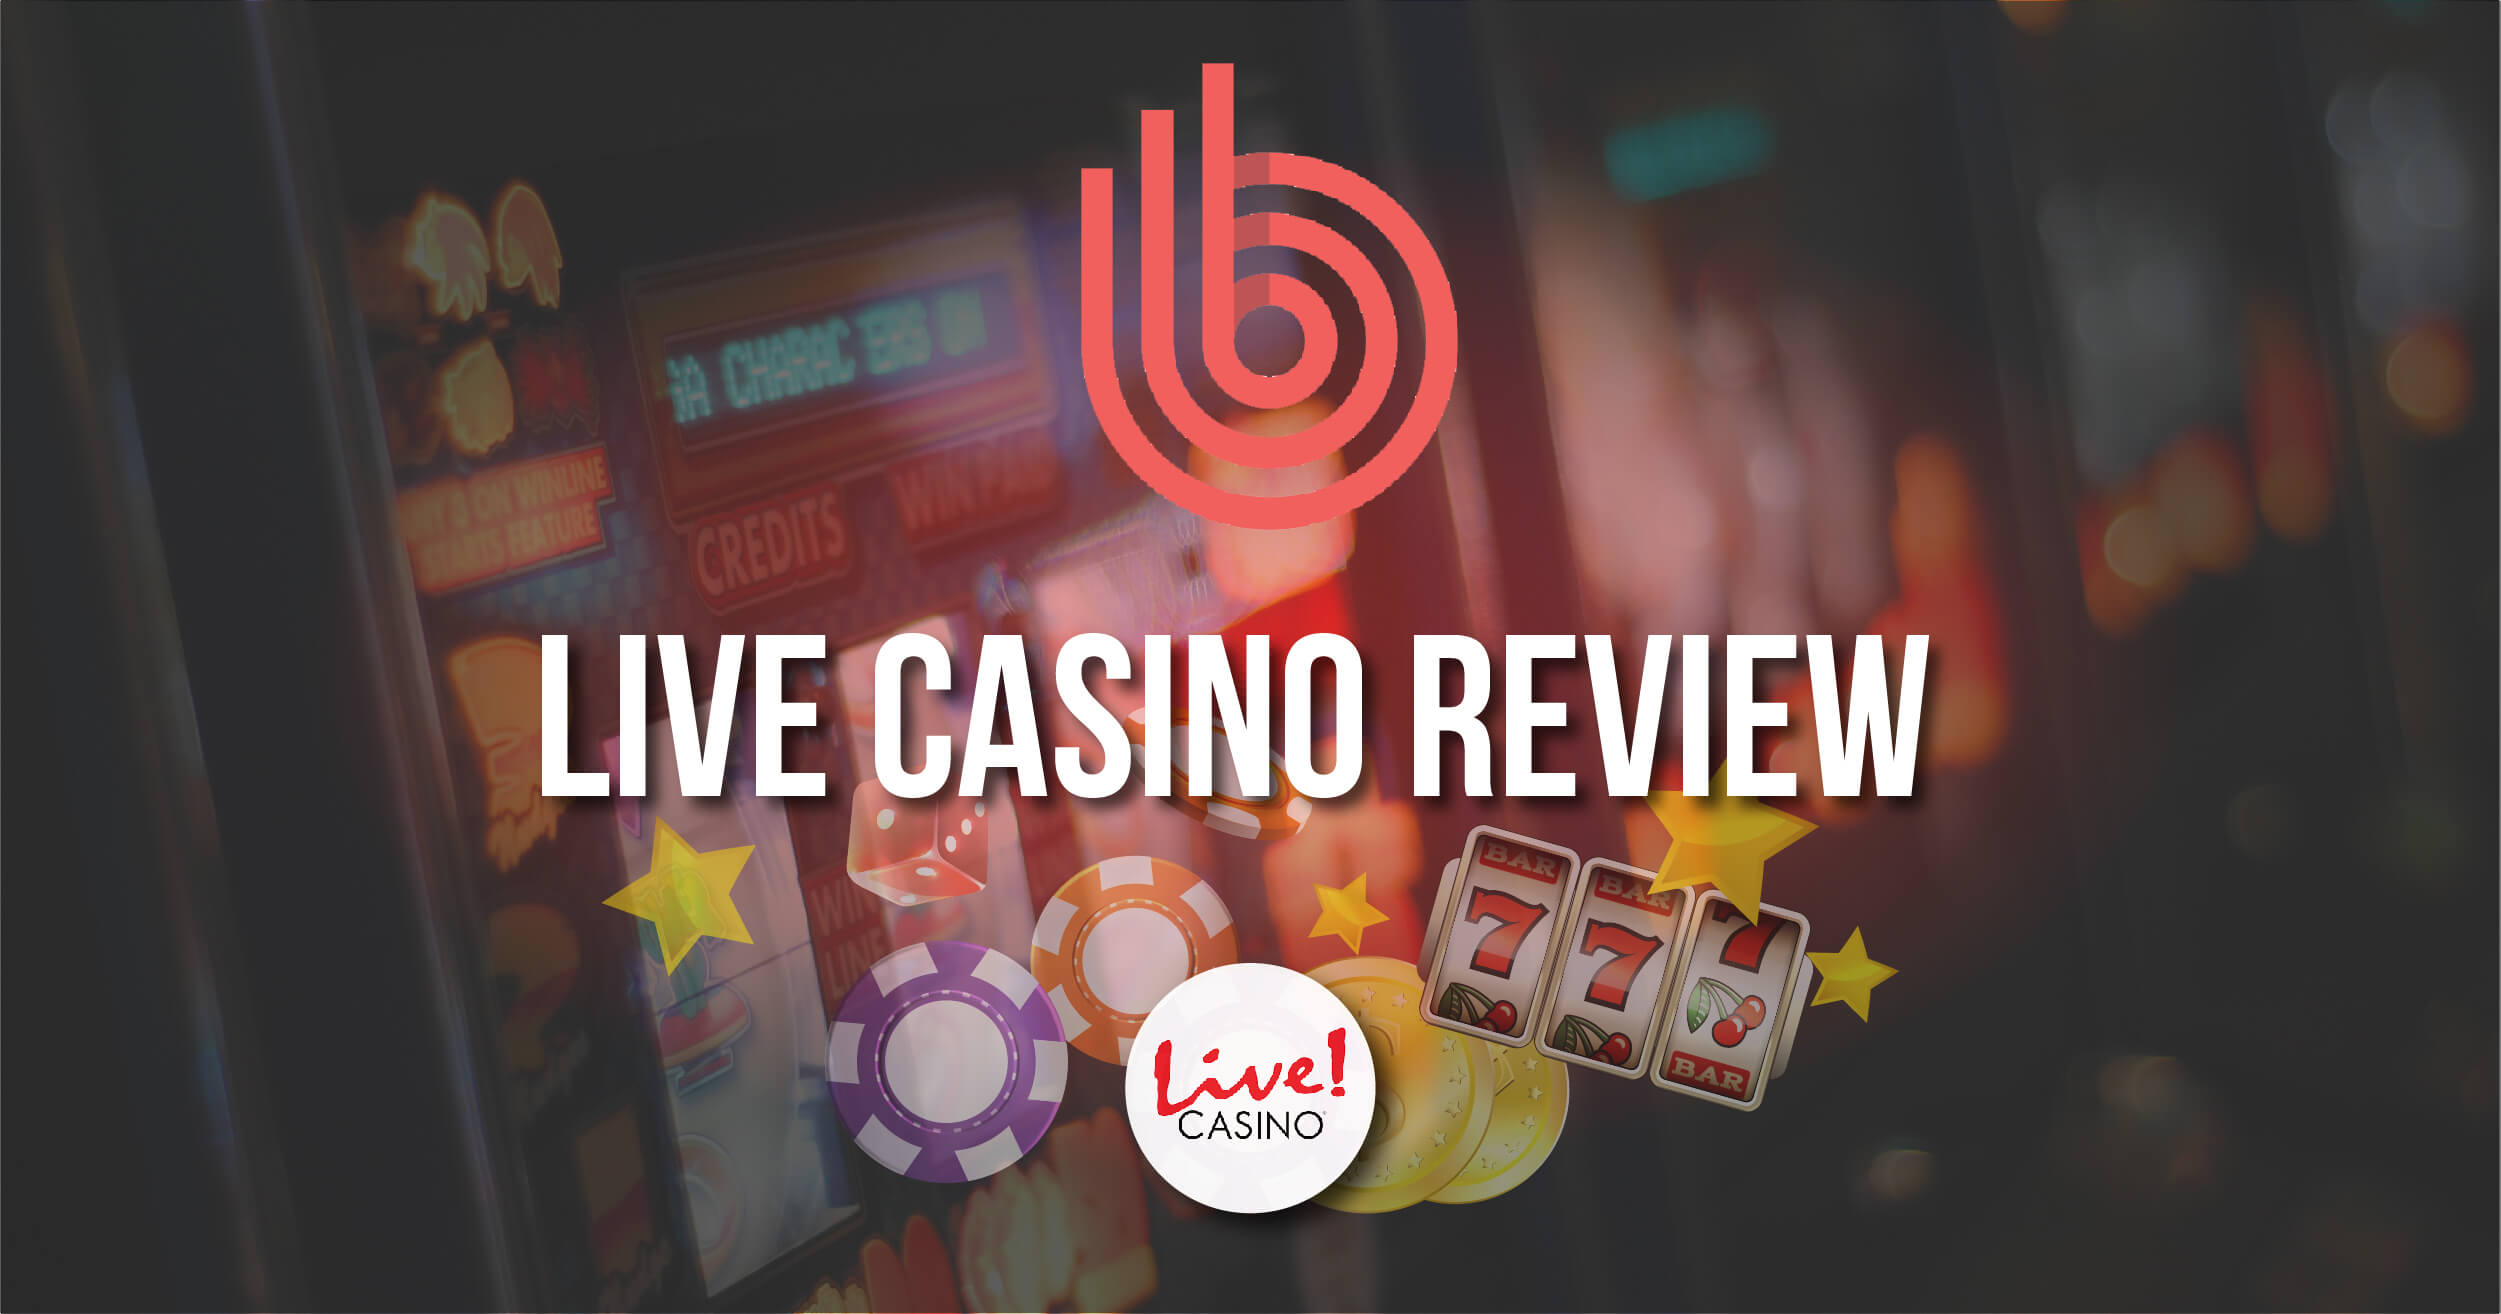 Live Casino Review